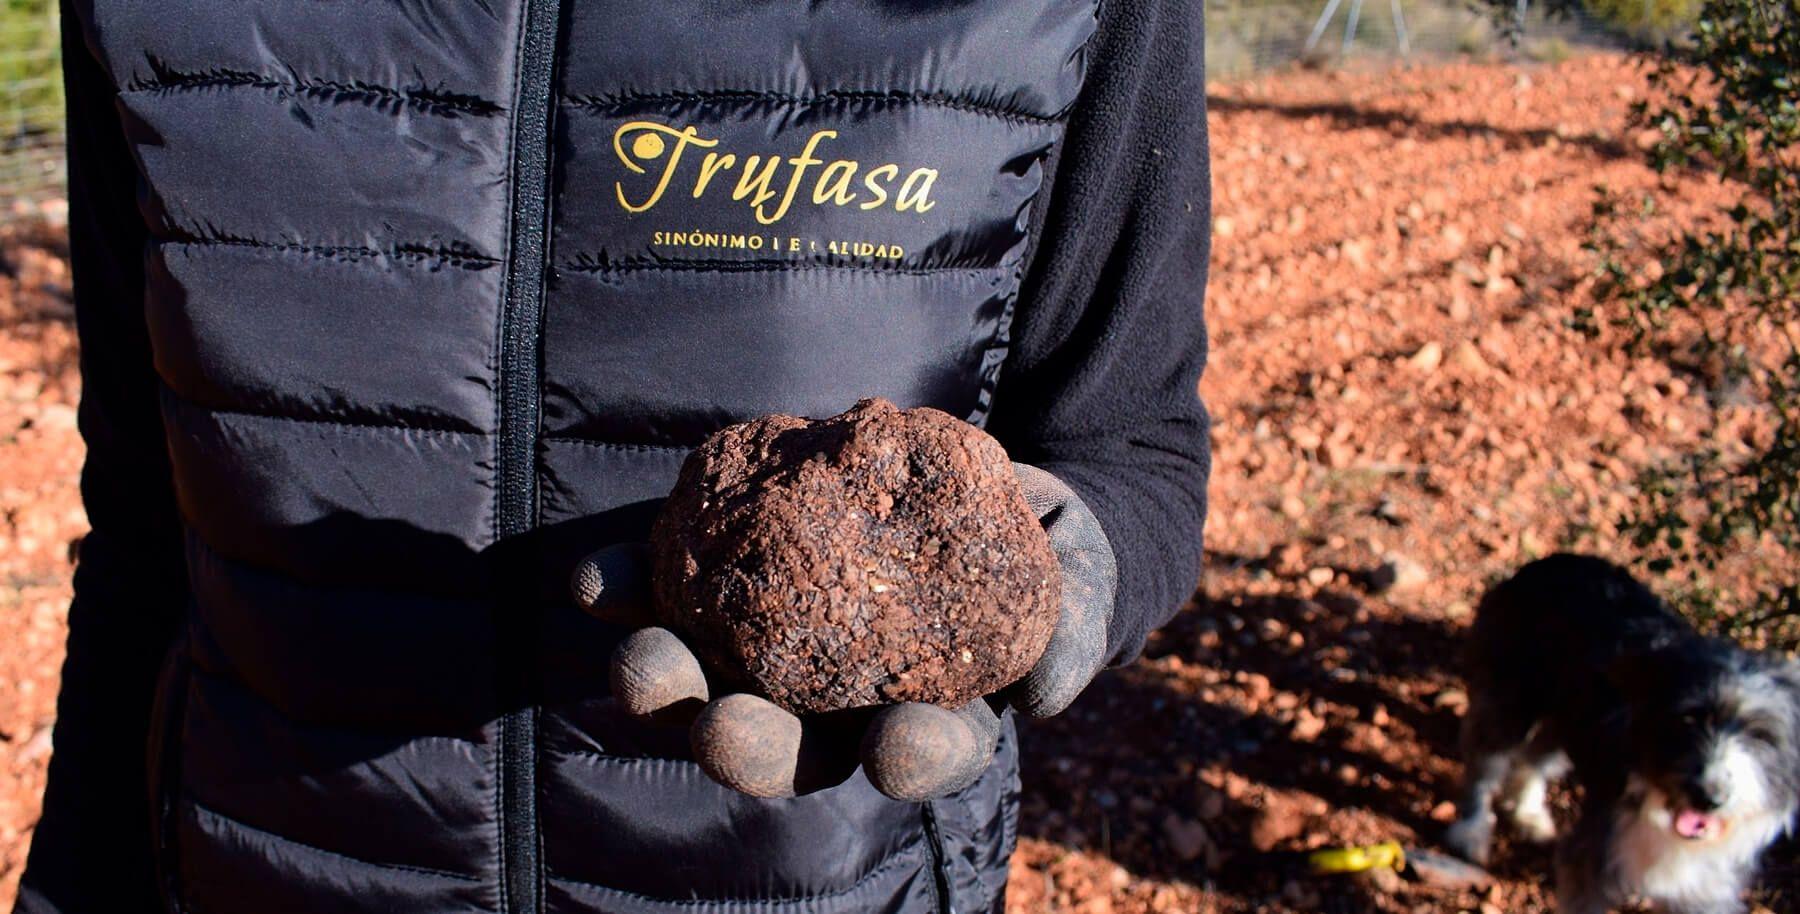 La trufa negra de cultivo sostenible de Trufasa, la gran protagonista de la temporada de la trufa